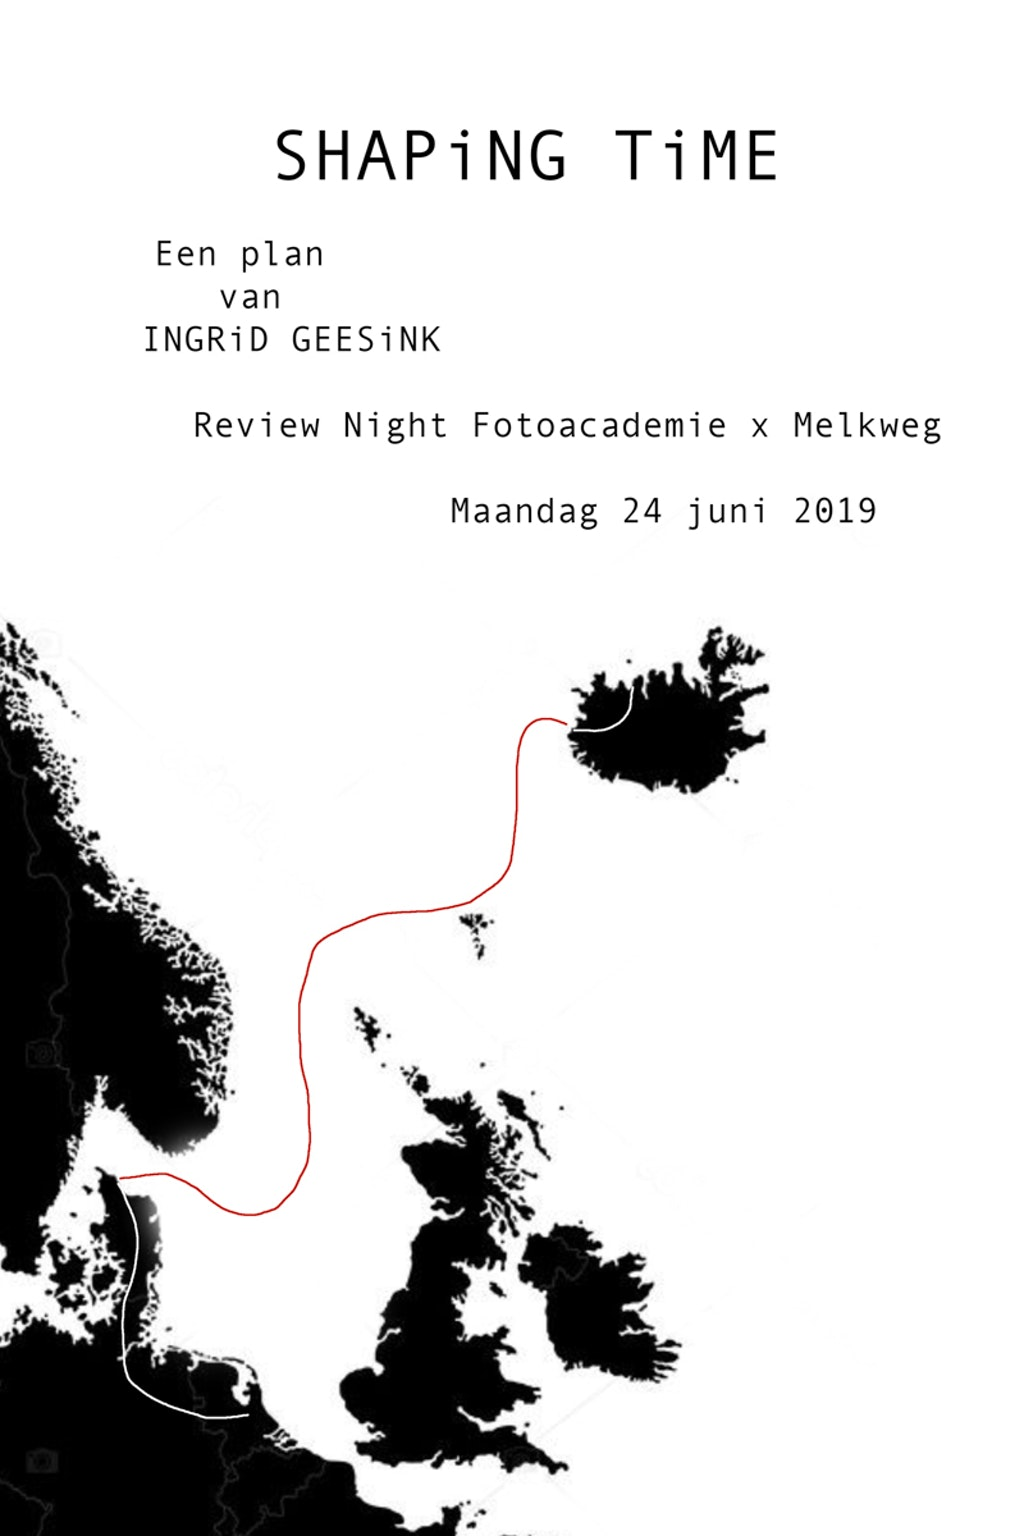 Melkweg review night 24 juni 2019